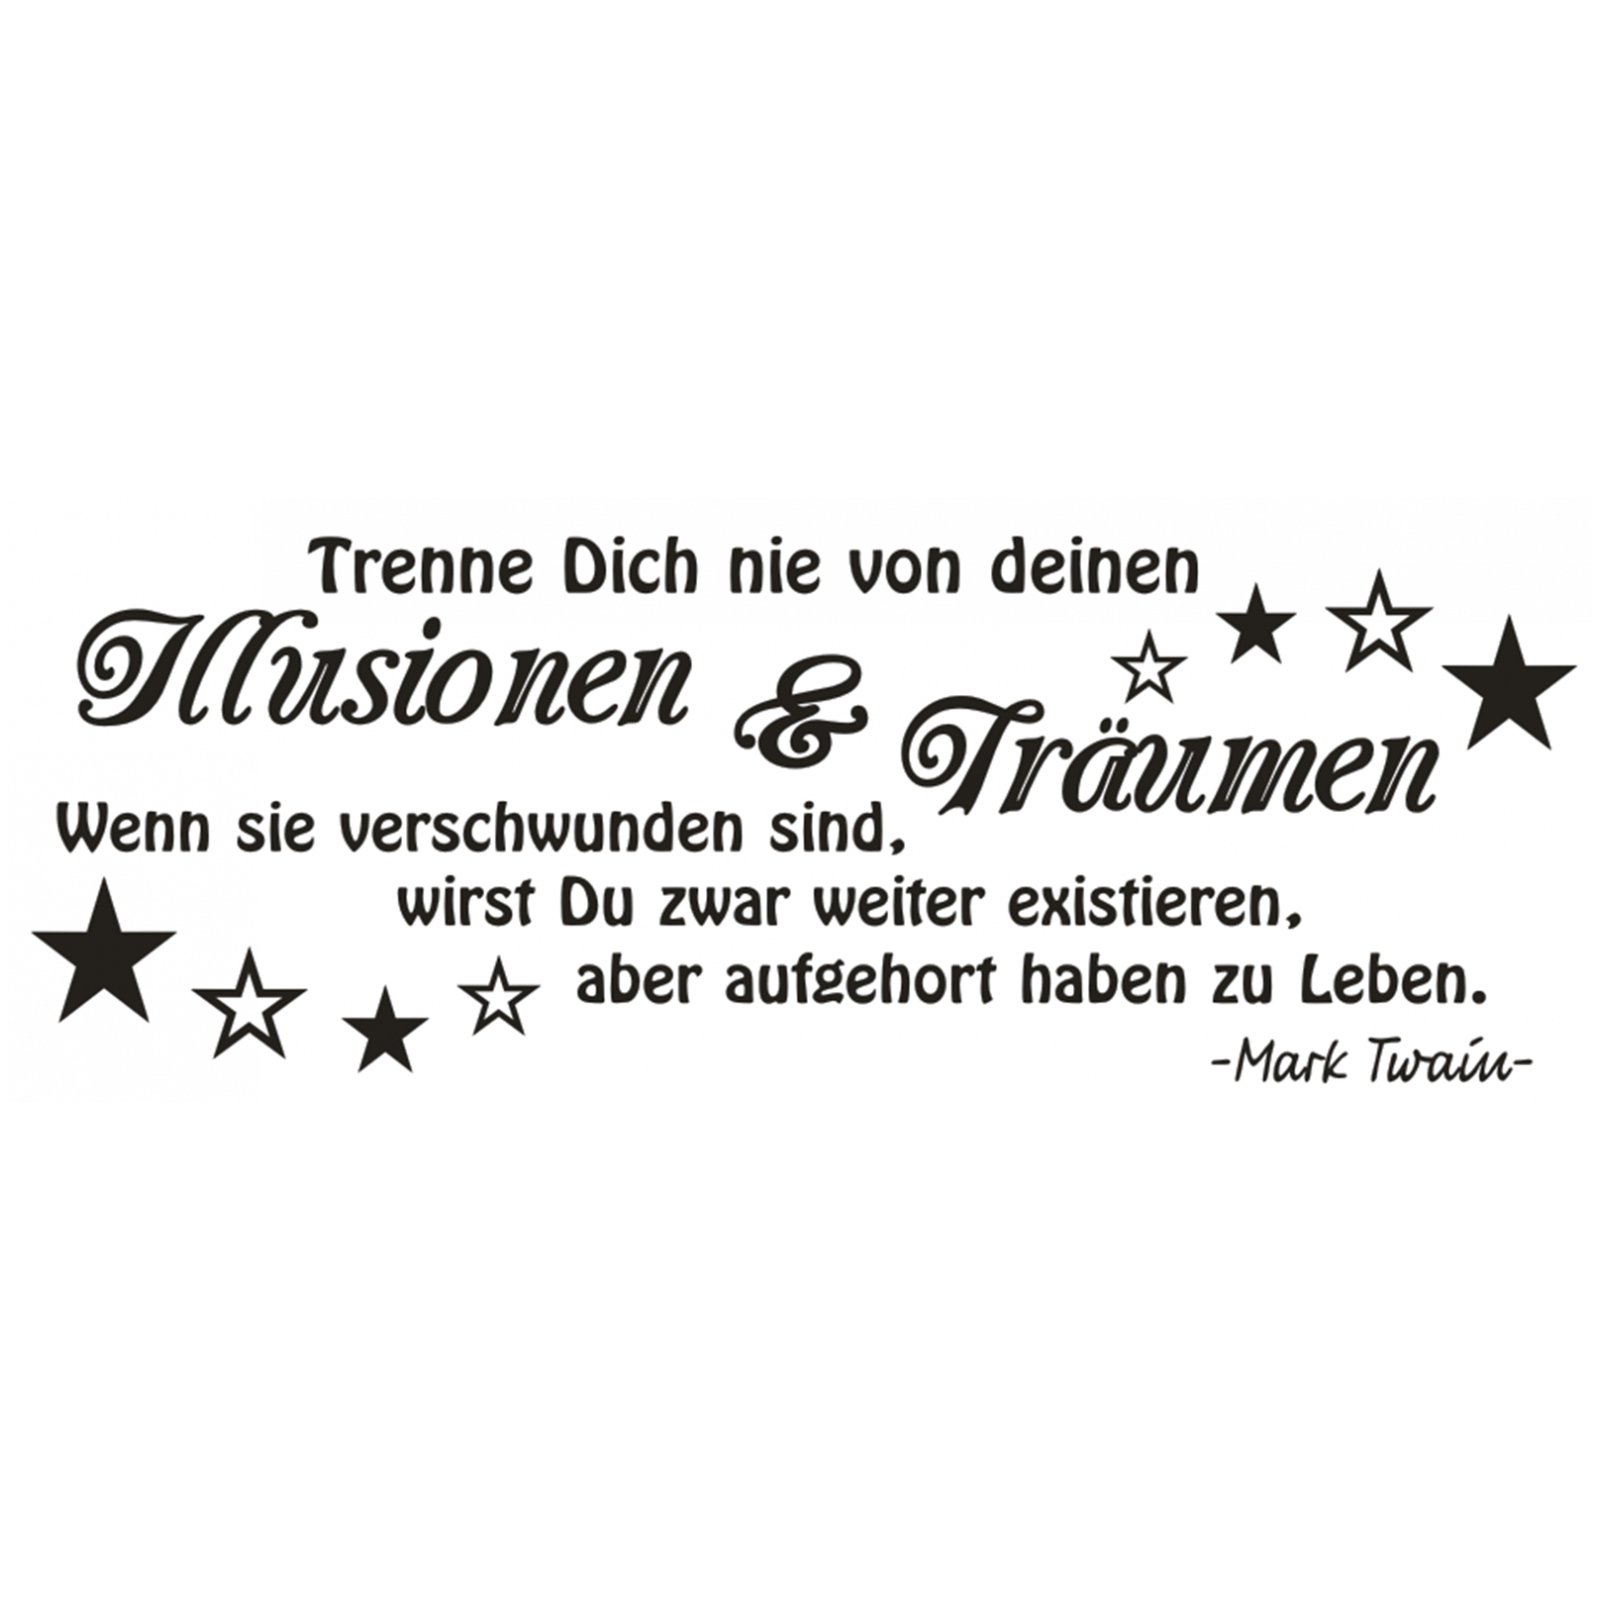 Wandtattoo-Spruch-Illusionen-Traeumen-Leben-Twain-Zitat-Wandaufkleber-Sticker-9 Indexbild 2